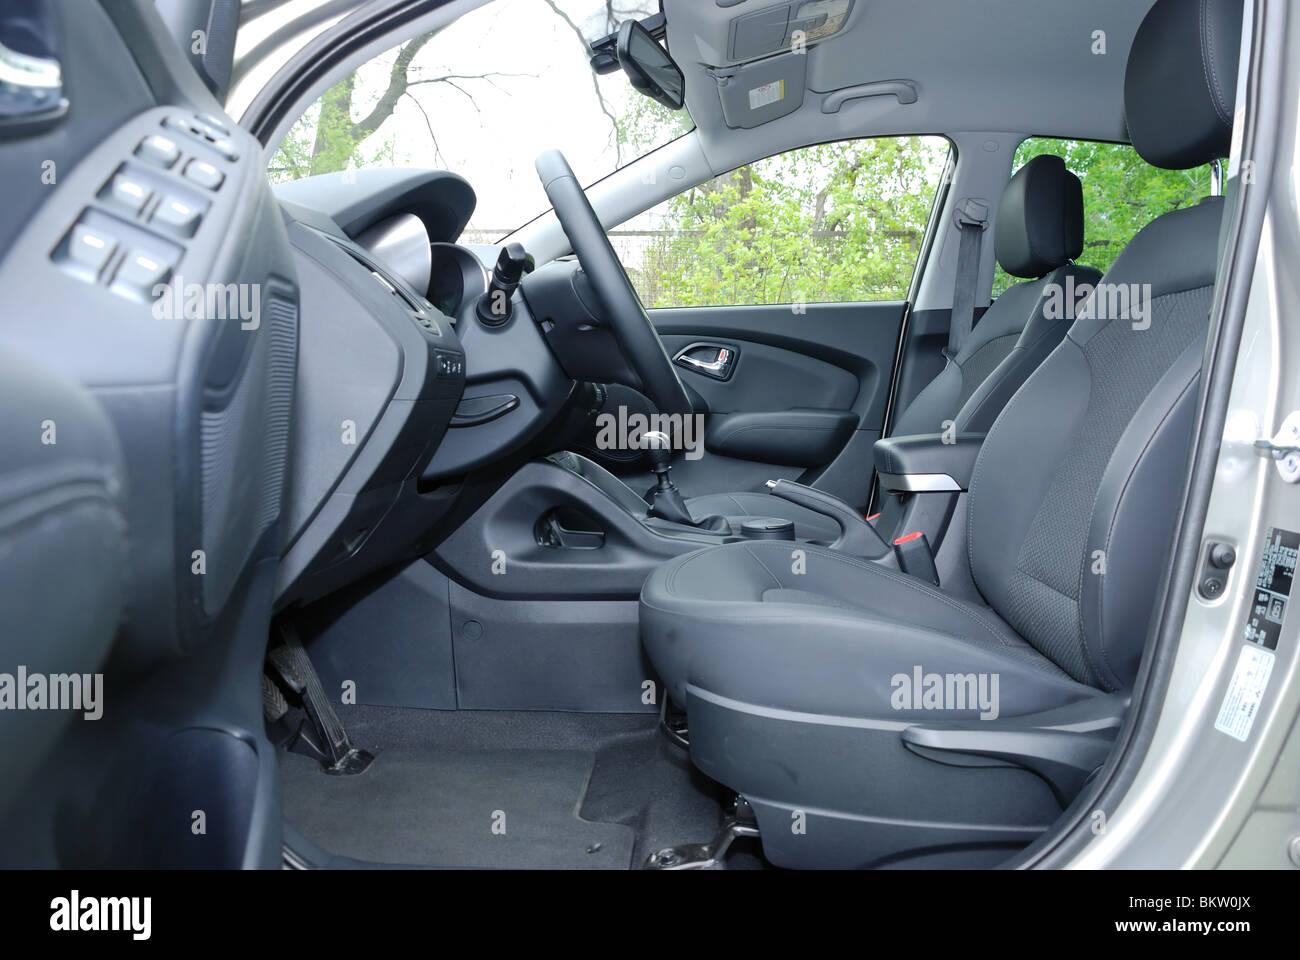 https://c8.alamy.com/comp/BKW0JX/hyundai-ix35-20-crdi-4x4-2010-korean-compact-suv-interior-cabin-BKW0JX.jpg